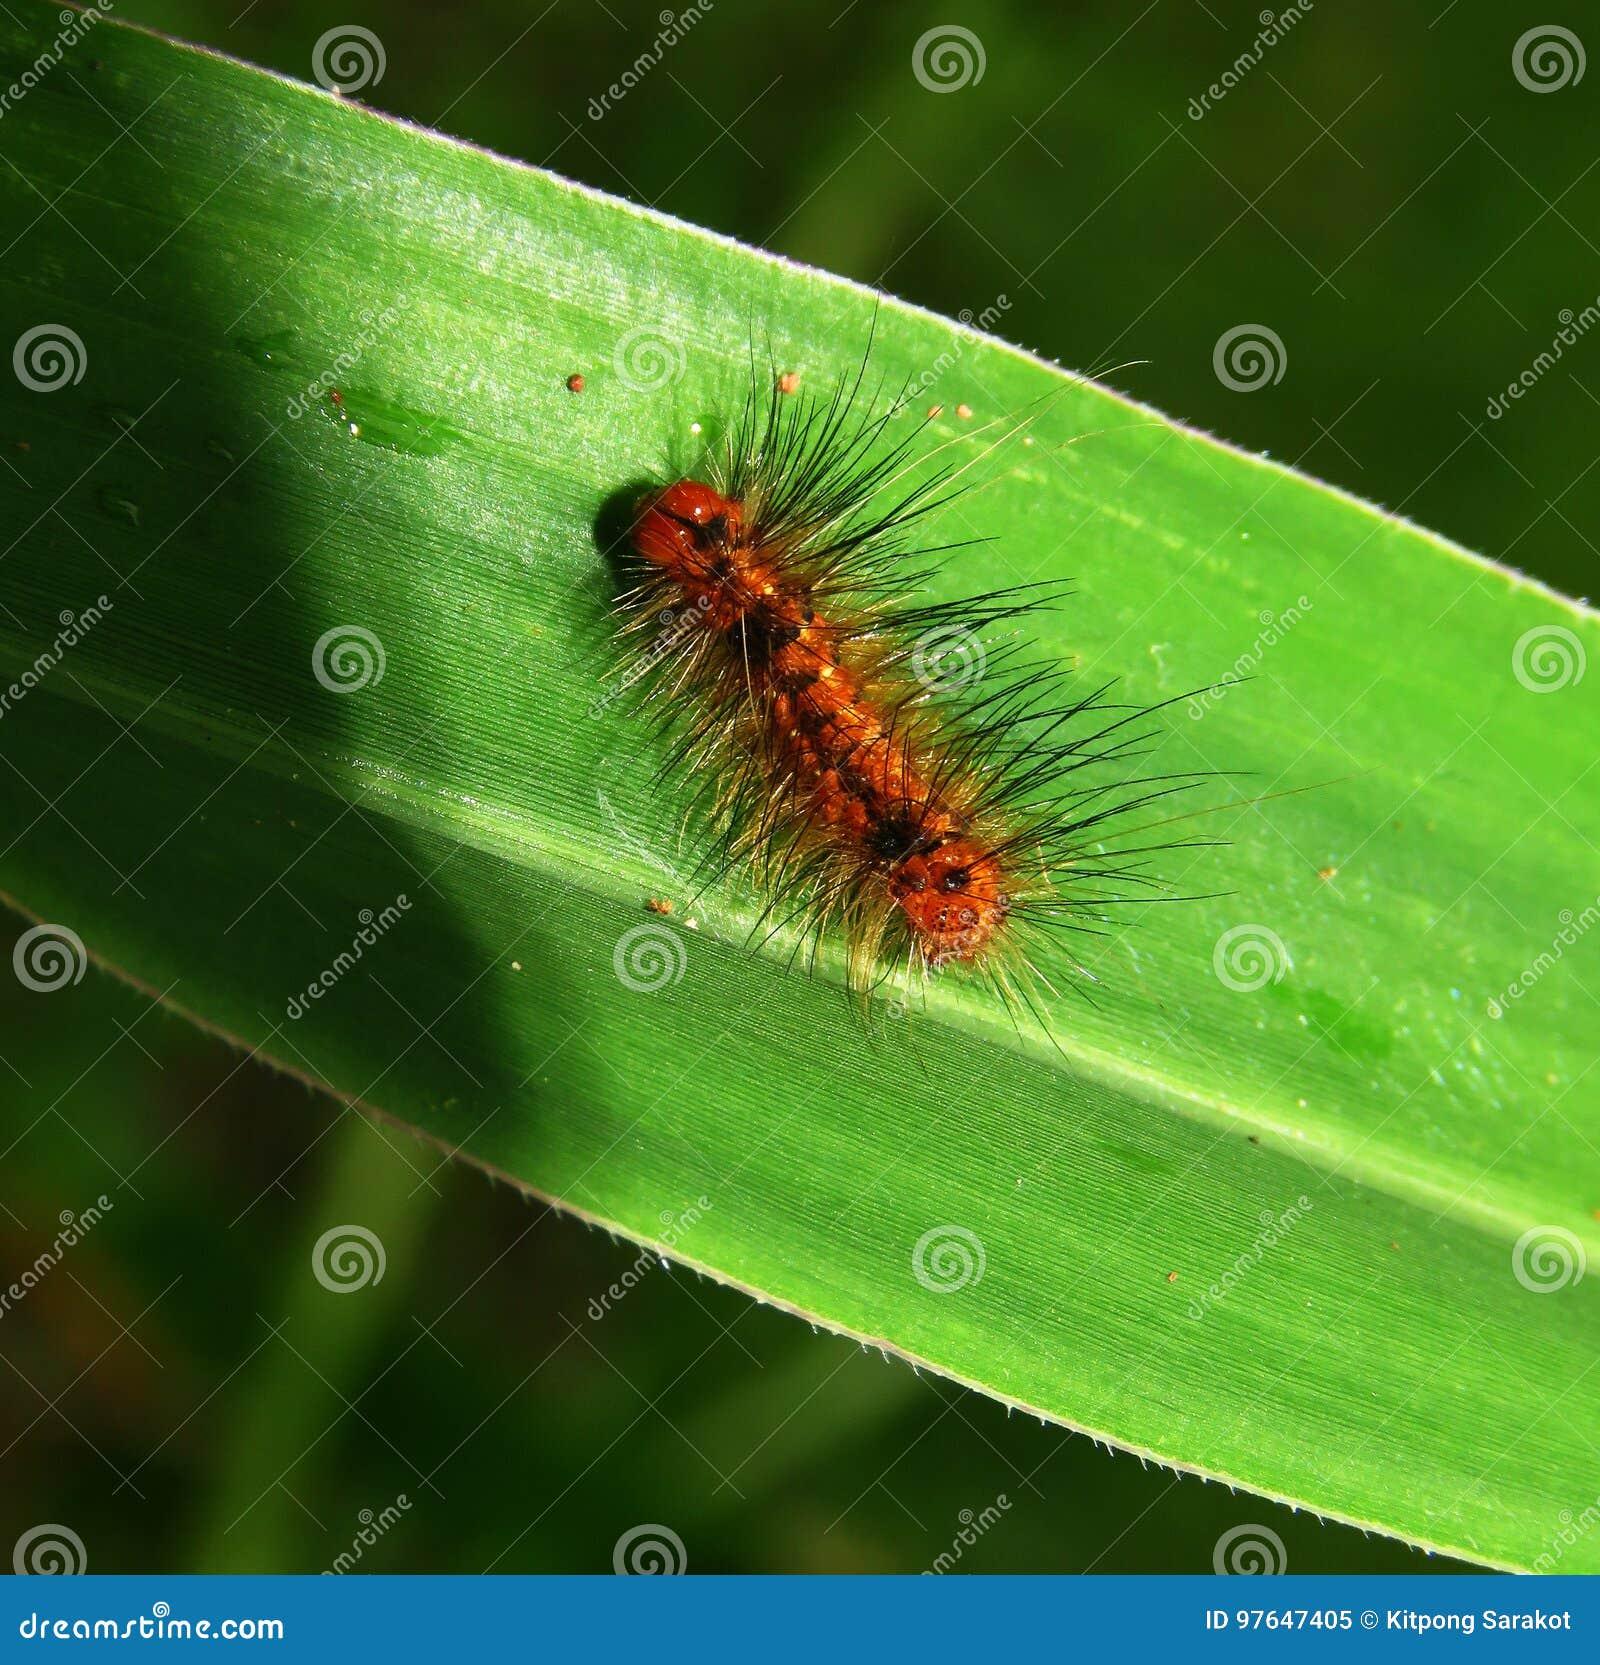 Chenille Caterpillar Papillon chenille de papillon en nature image stock - image du caterpillar